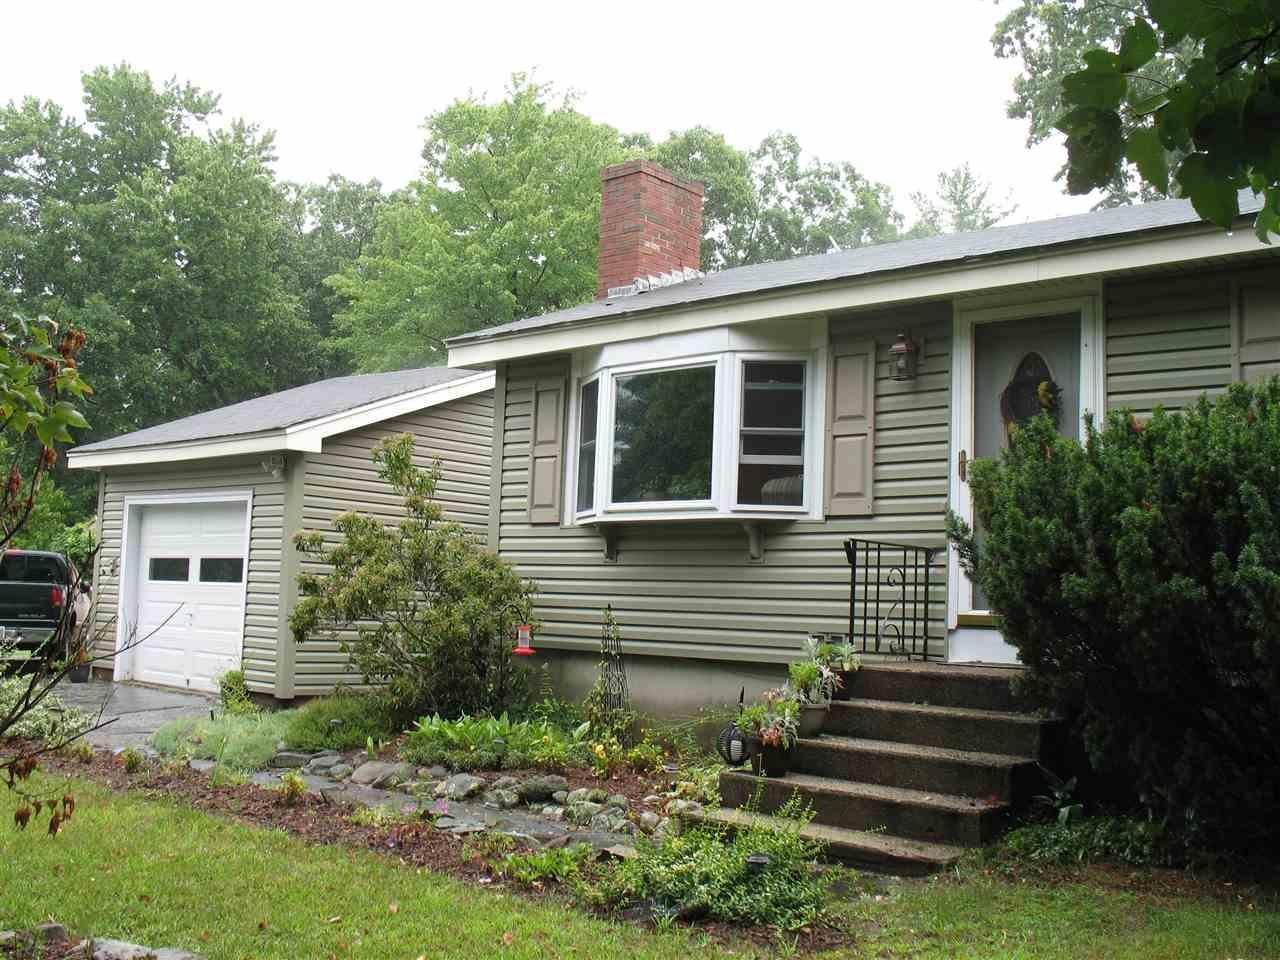 20 Monticello Dr Pelham Nh Mls 4654429 Better Homes